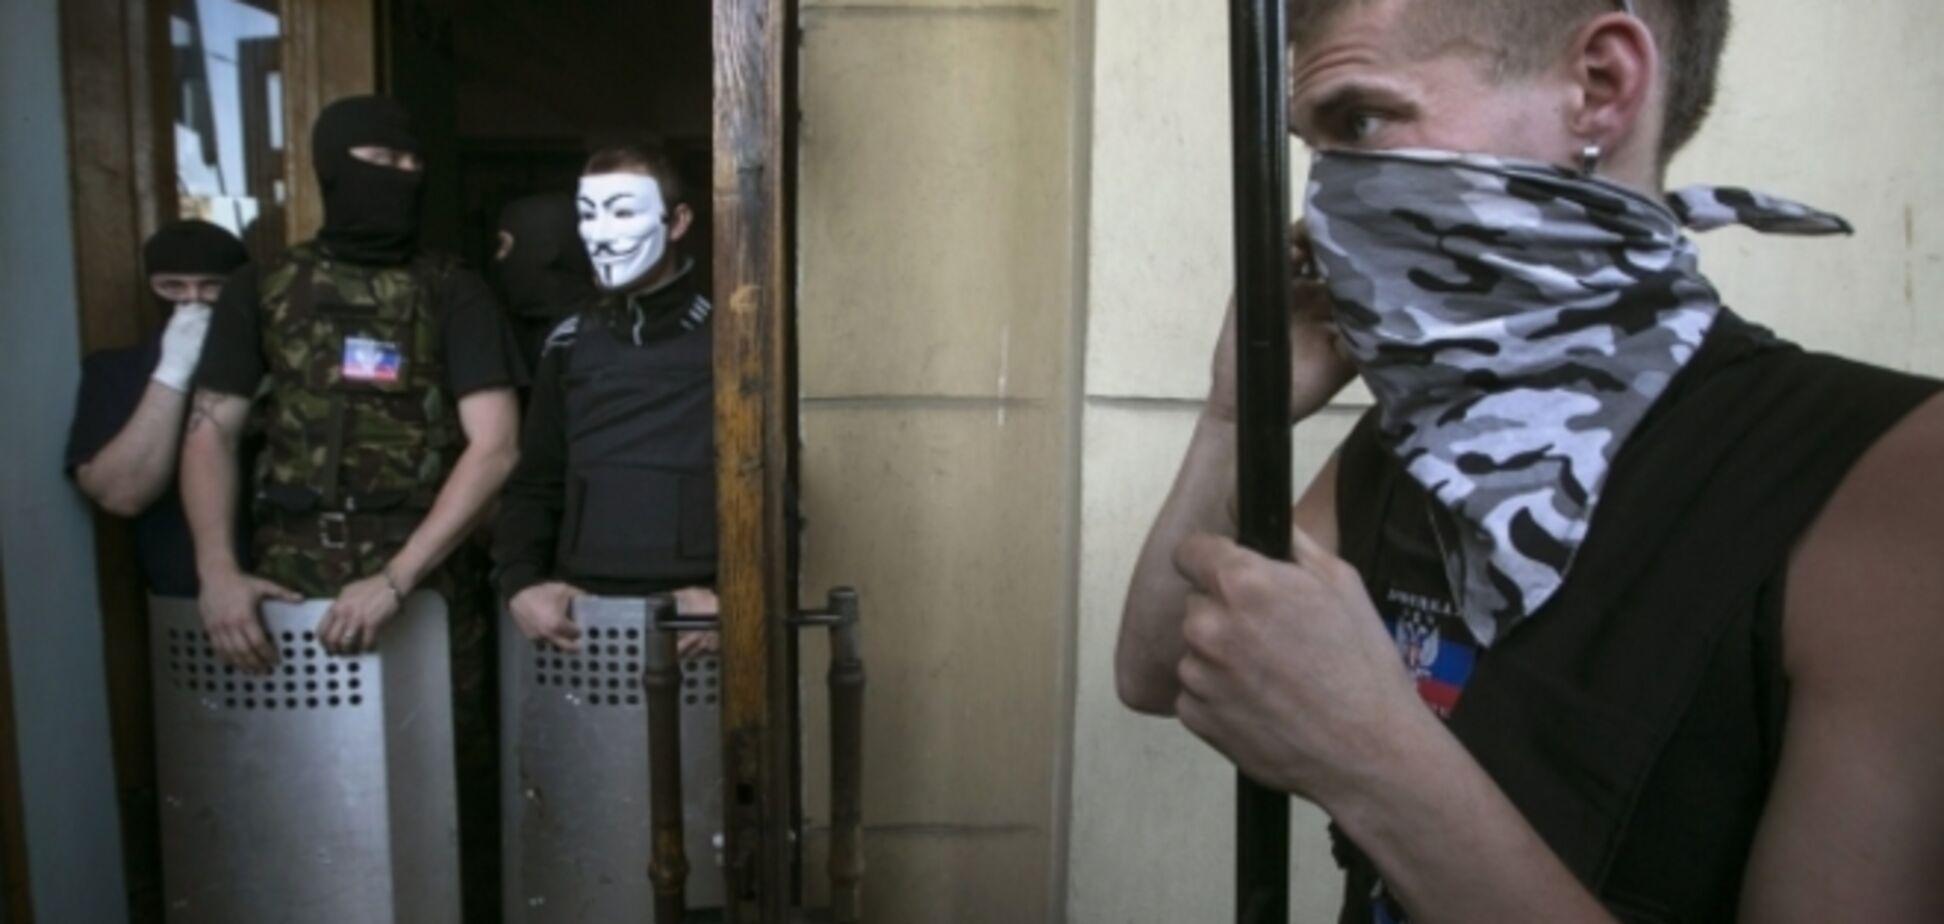 Терористи захопили два телеканали в Донецьку